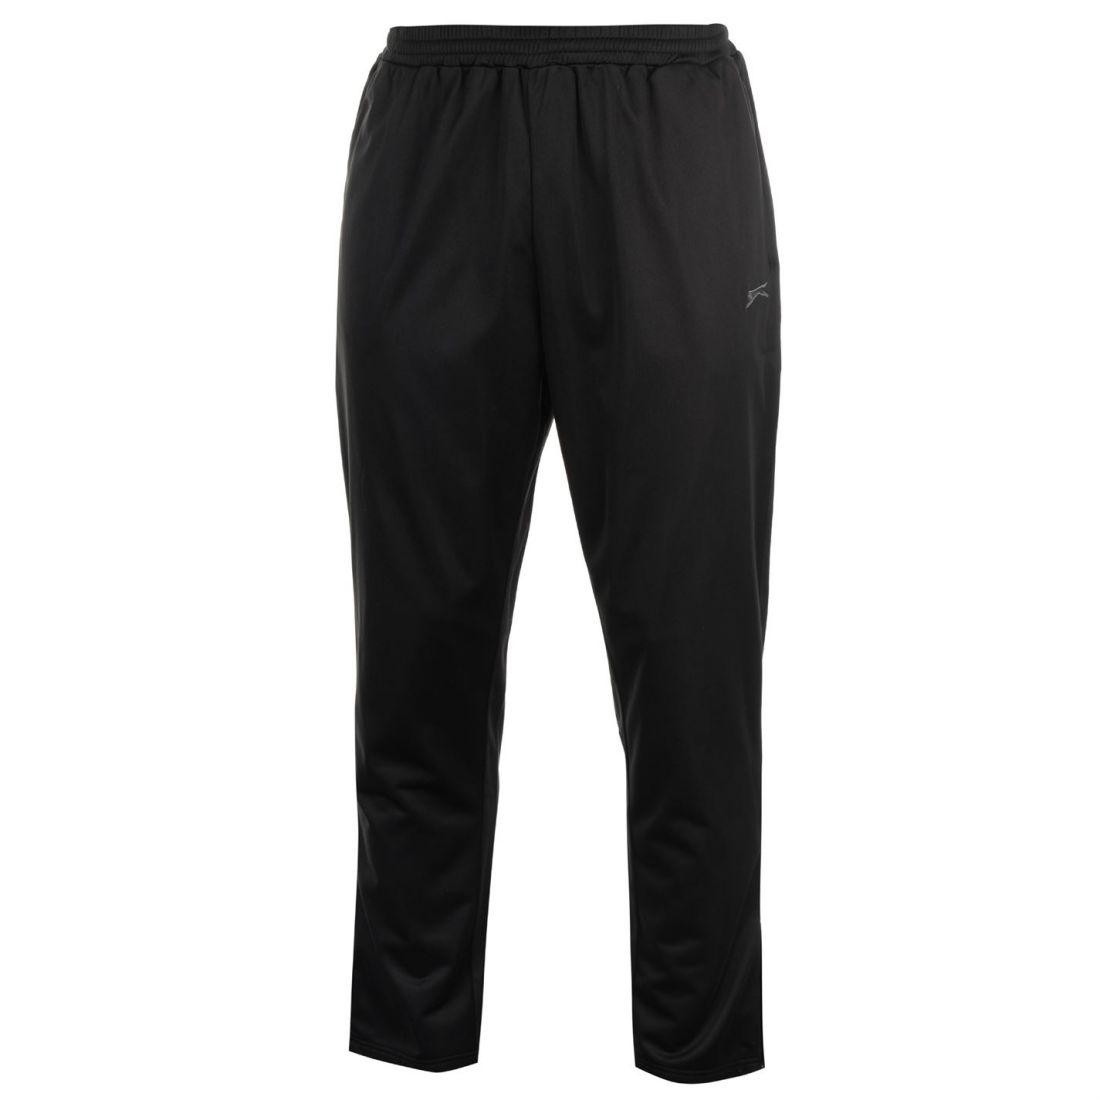 4dfbf213960 Image is loading Slazenger-Mens-Poly-Pants-Gents-Sports-Training-Running-